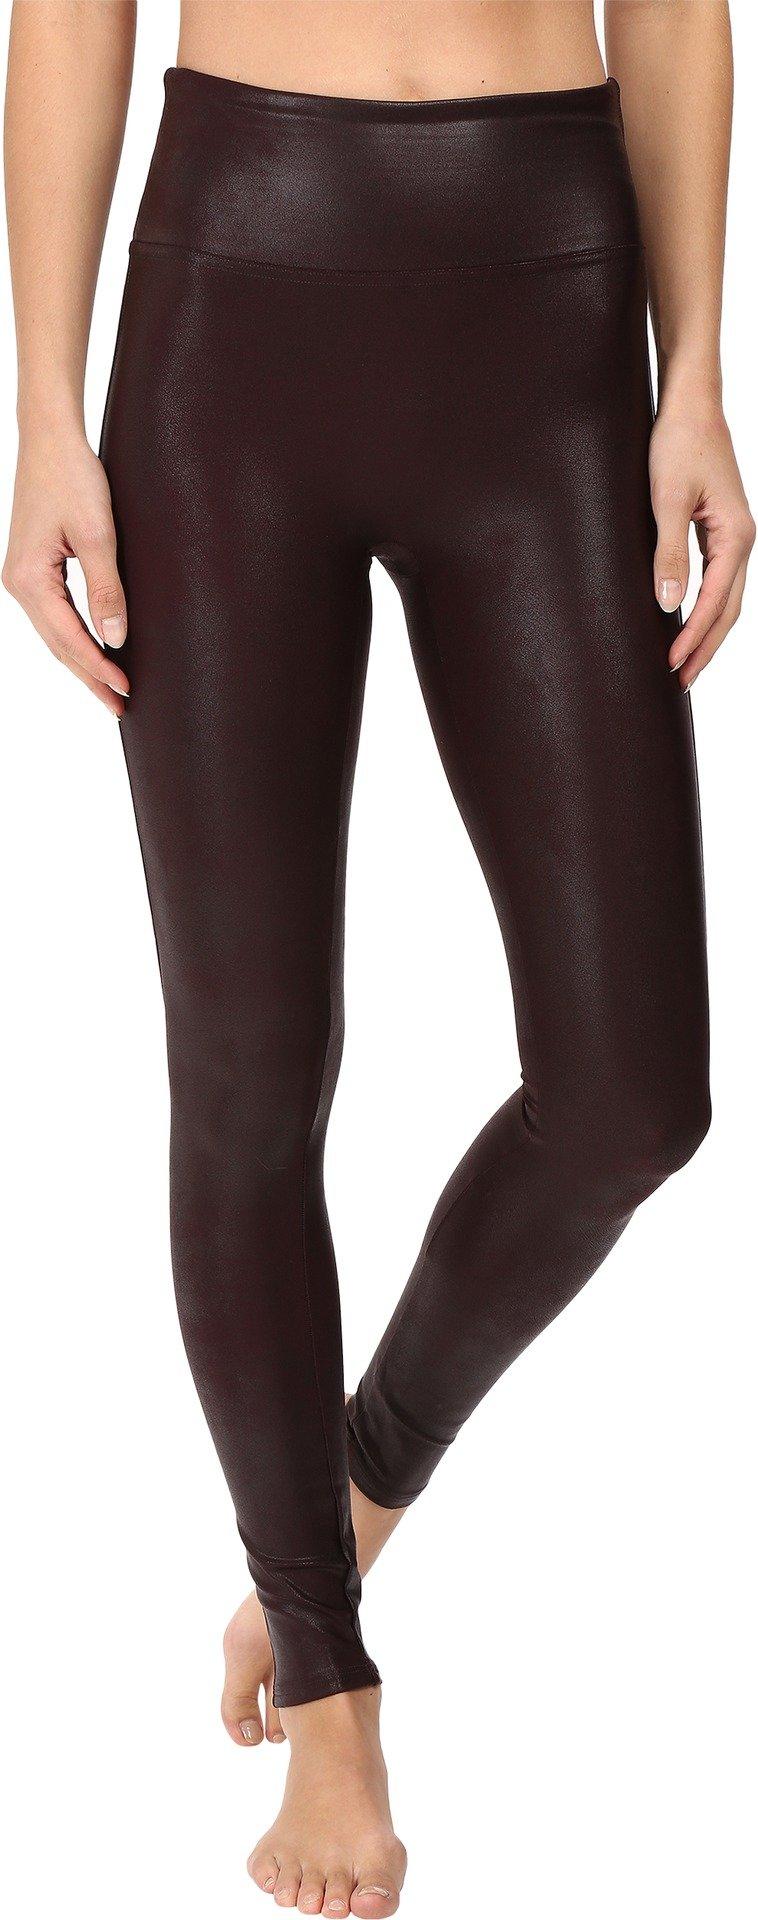 SPANX Women's Ready-to-Wow Faux Leather Leggings, Wine, Medium